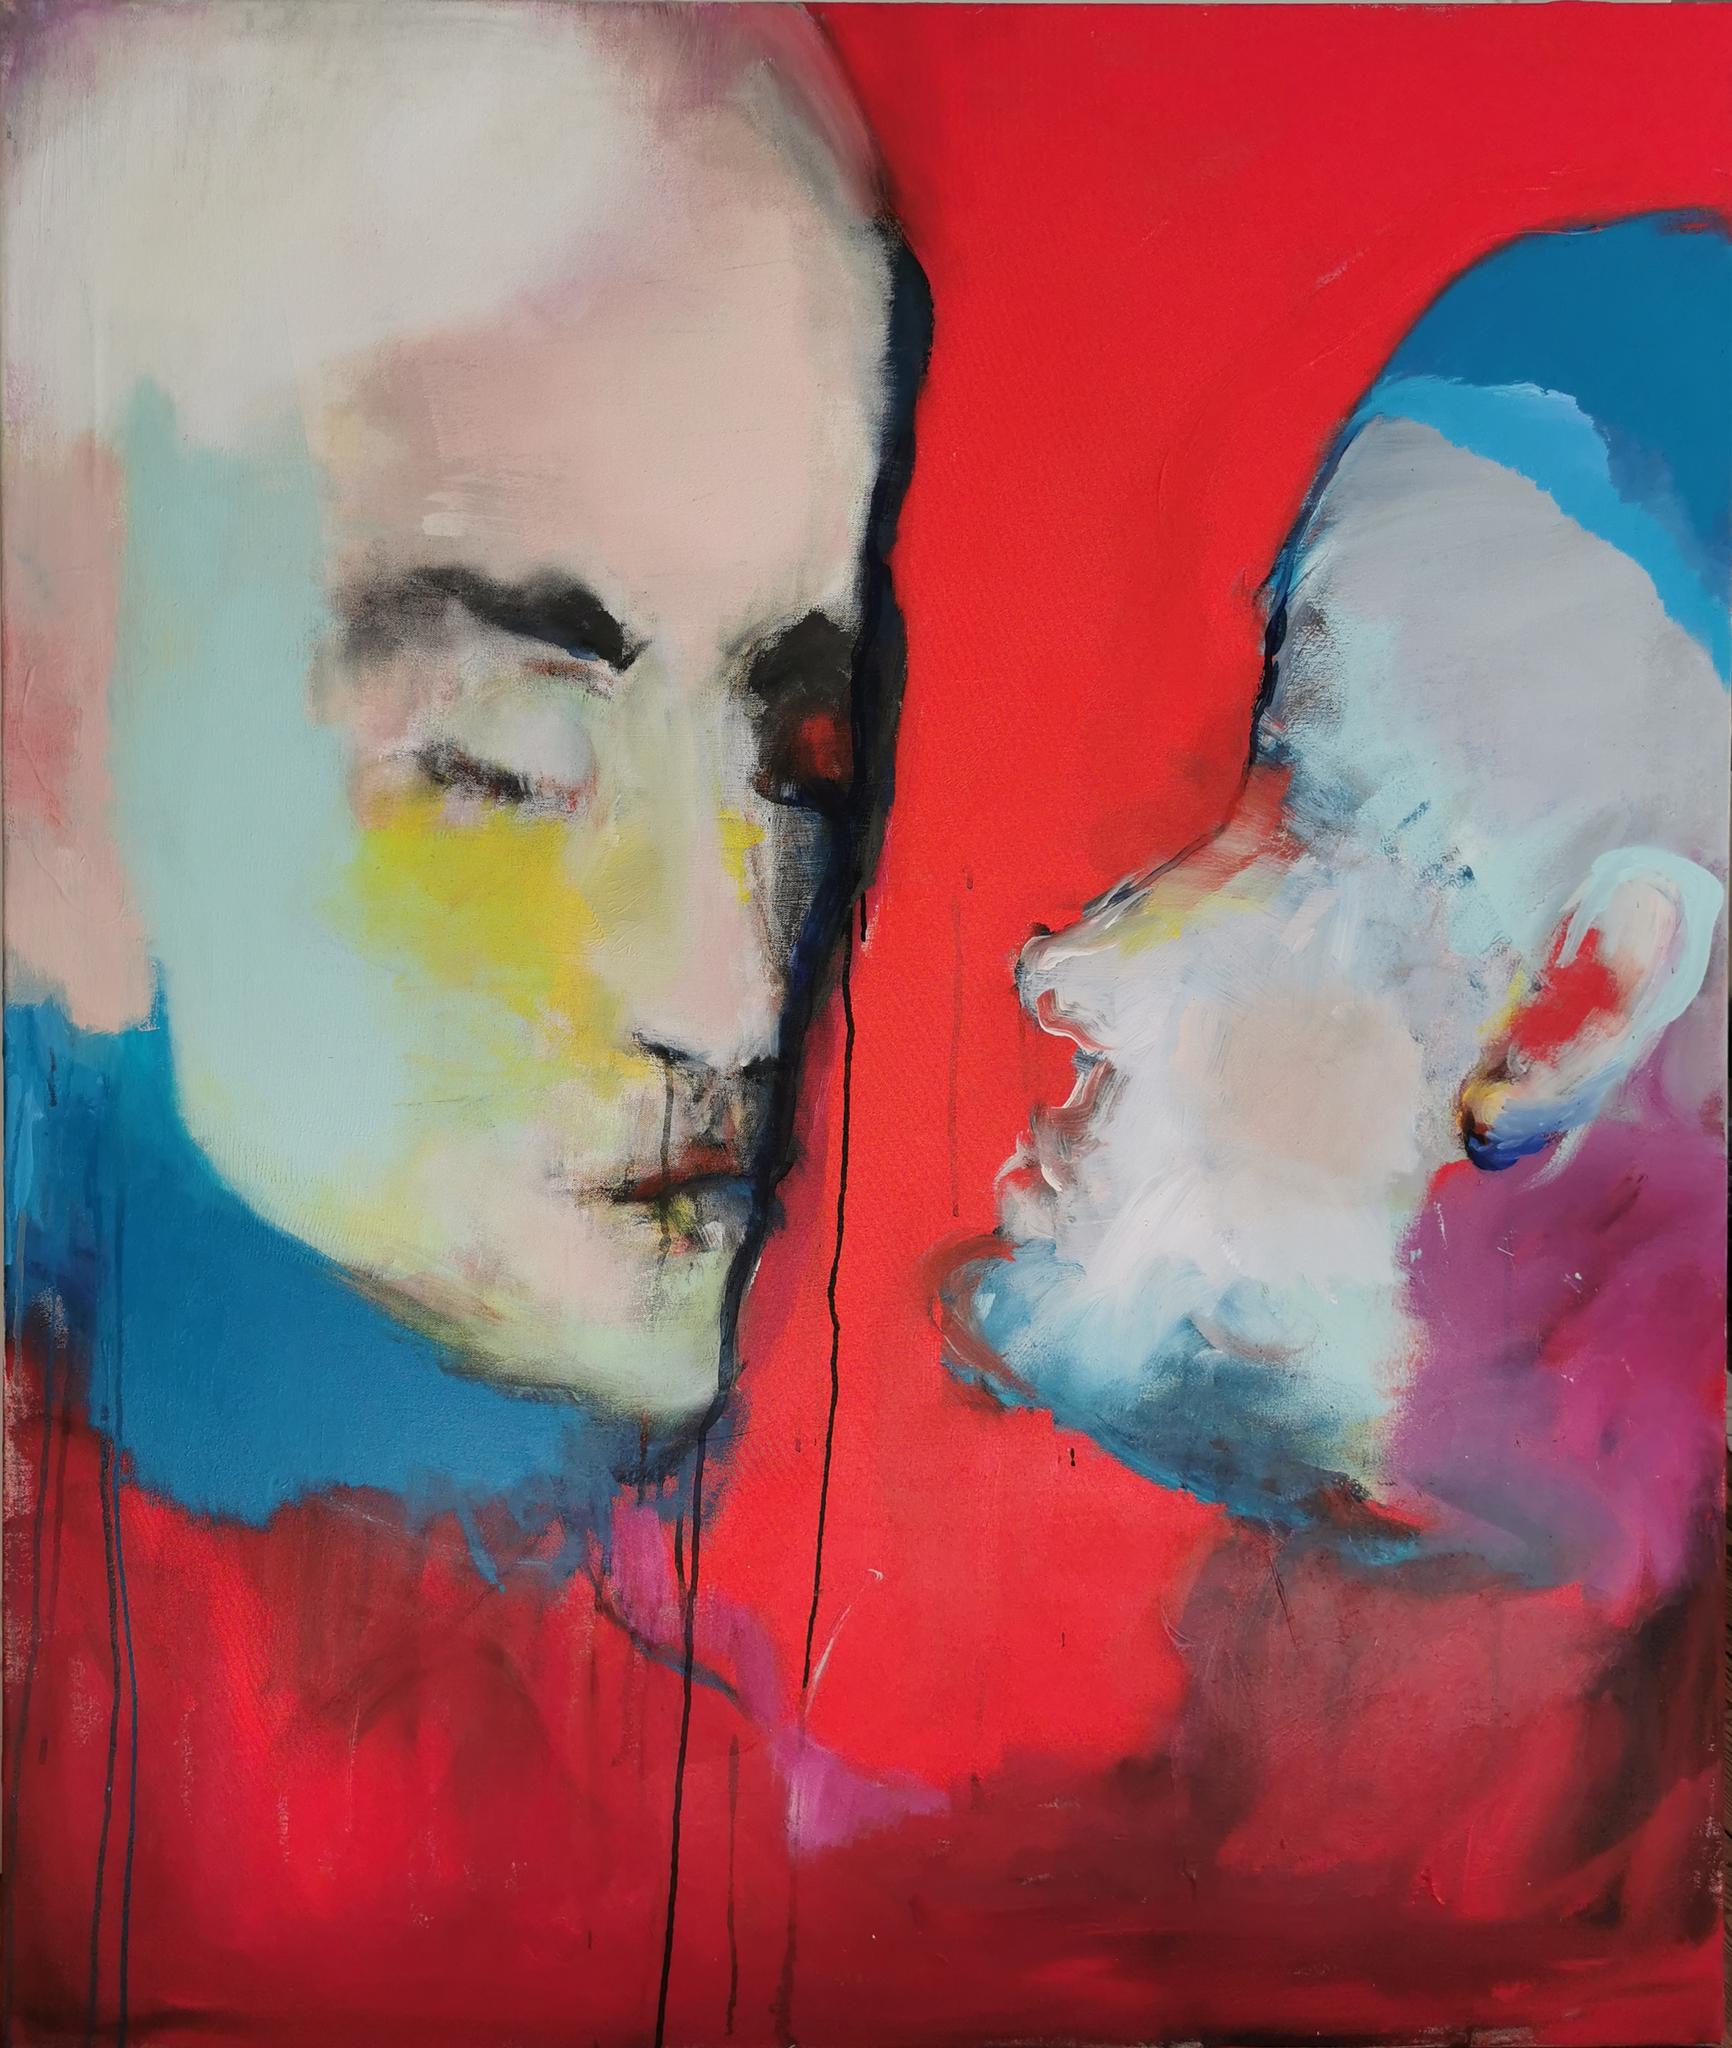 Das Rot (Acrylic, Graphite, Ink on Canvas, 120 x 100cm)